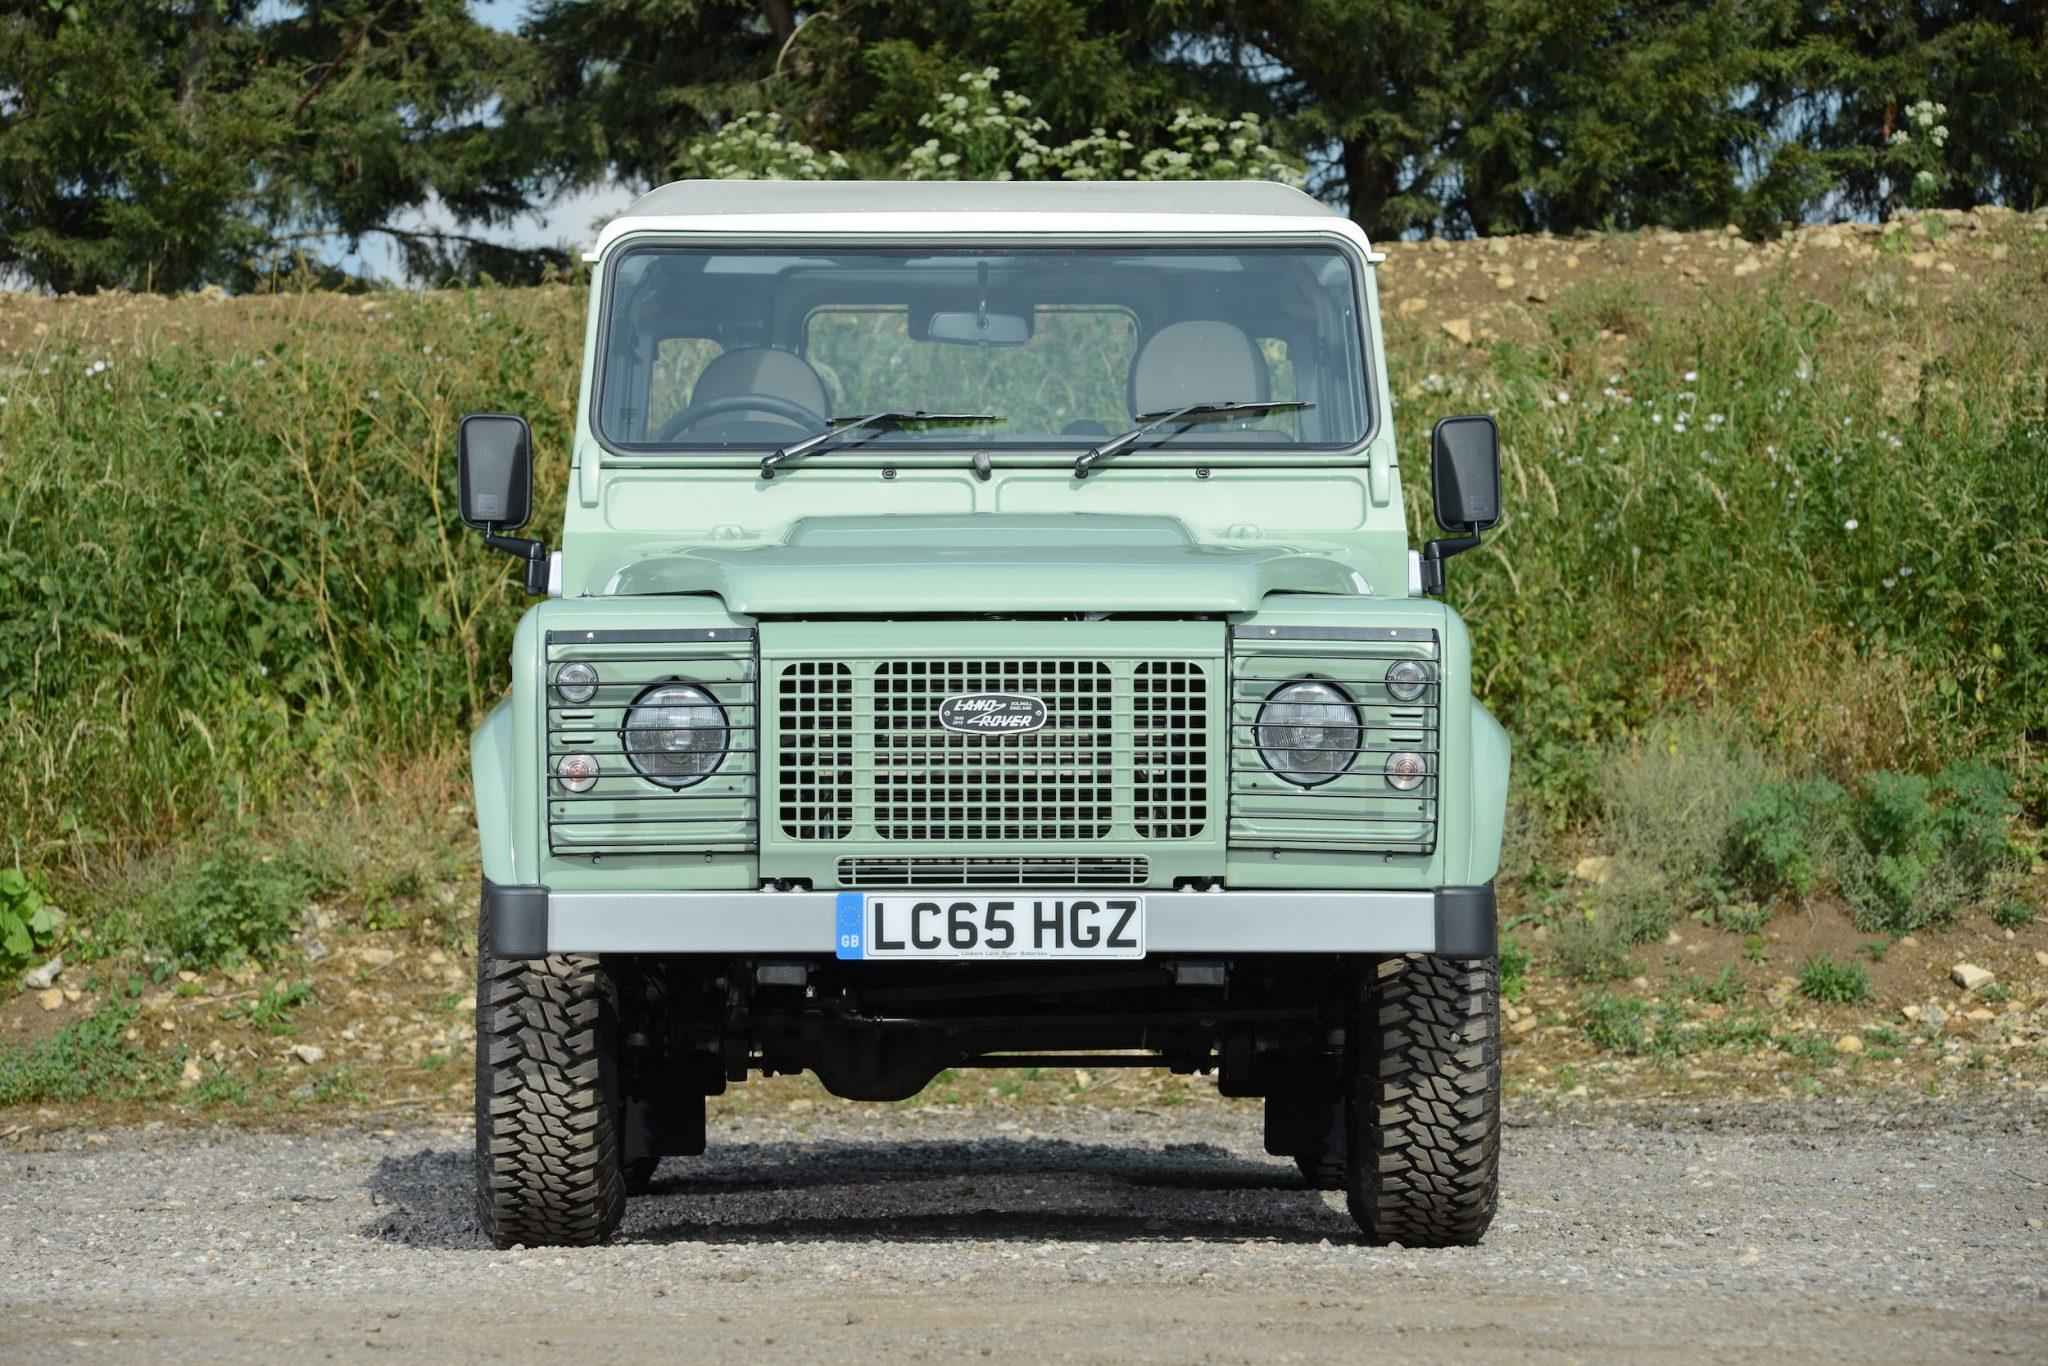 Rowan Atkinson's Land Rover Defender 4 - Rowan Atkinson's Land Rover Defender